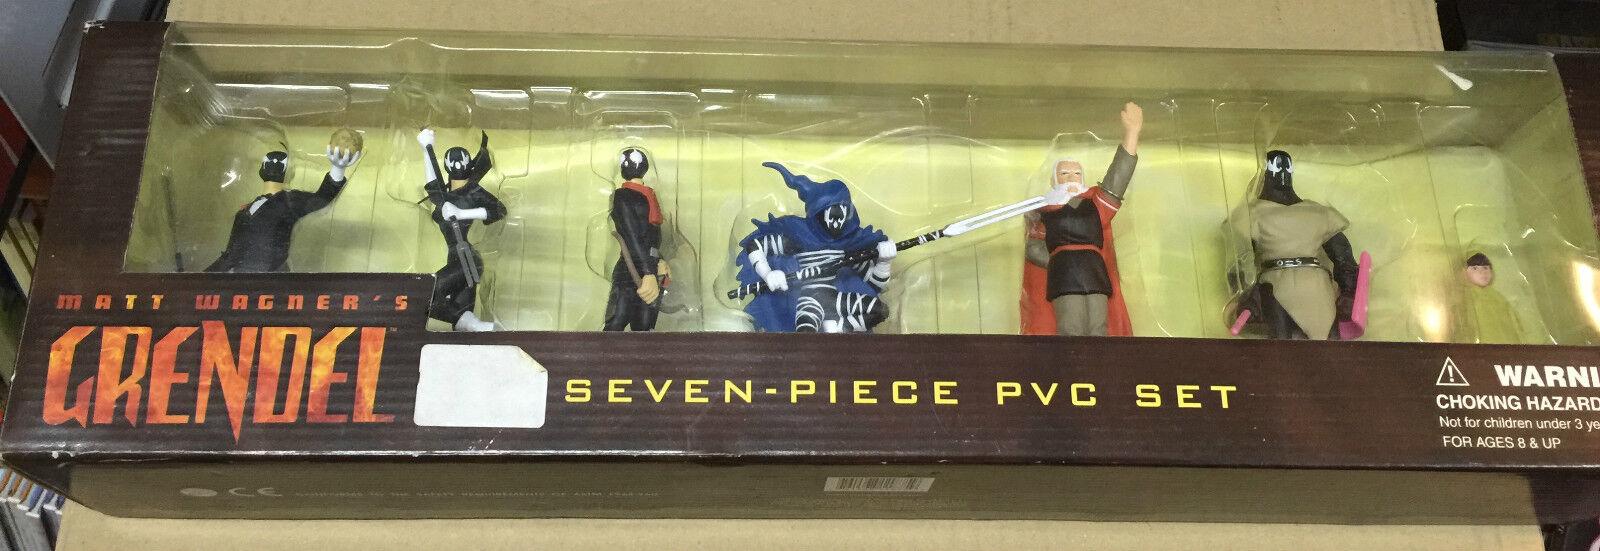 Matt Wagner´s Grendel Seven Piece Pvc Set, Nuevo